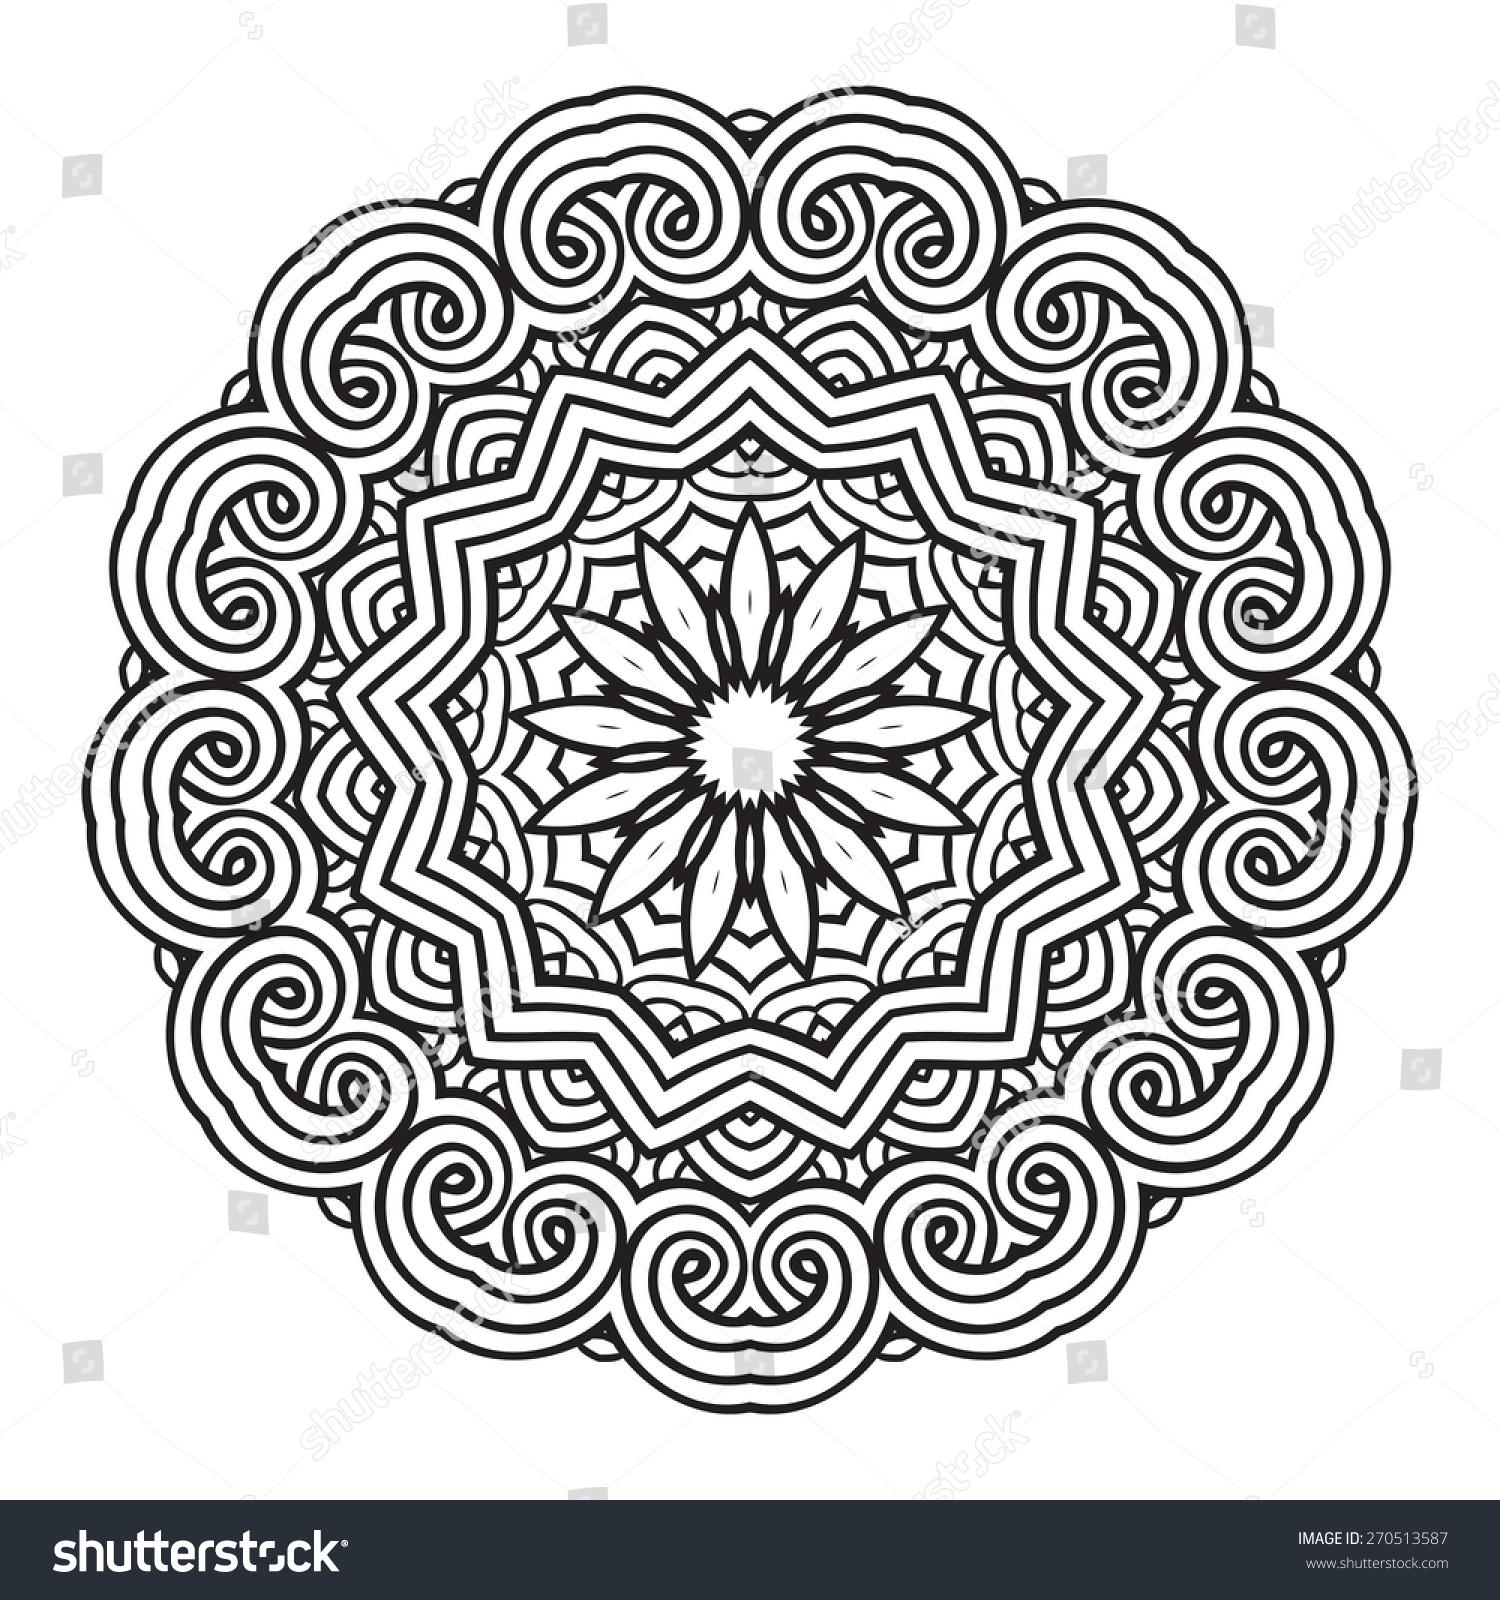 Ethnic Fractal Mandala Vector Circle Meditation Stock Vector ...